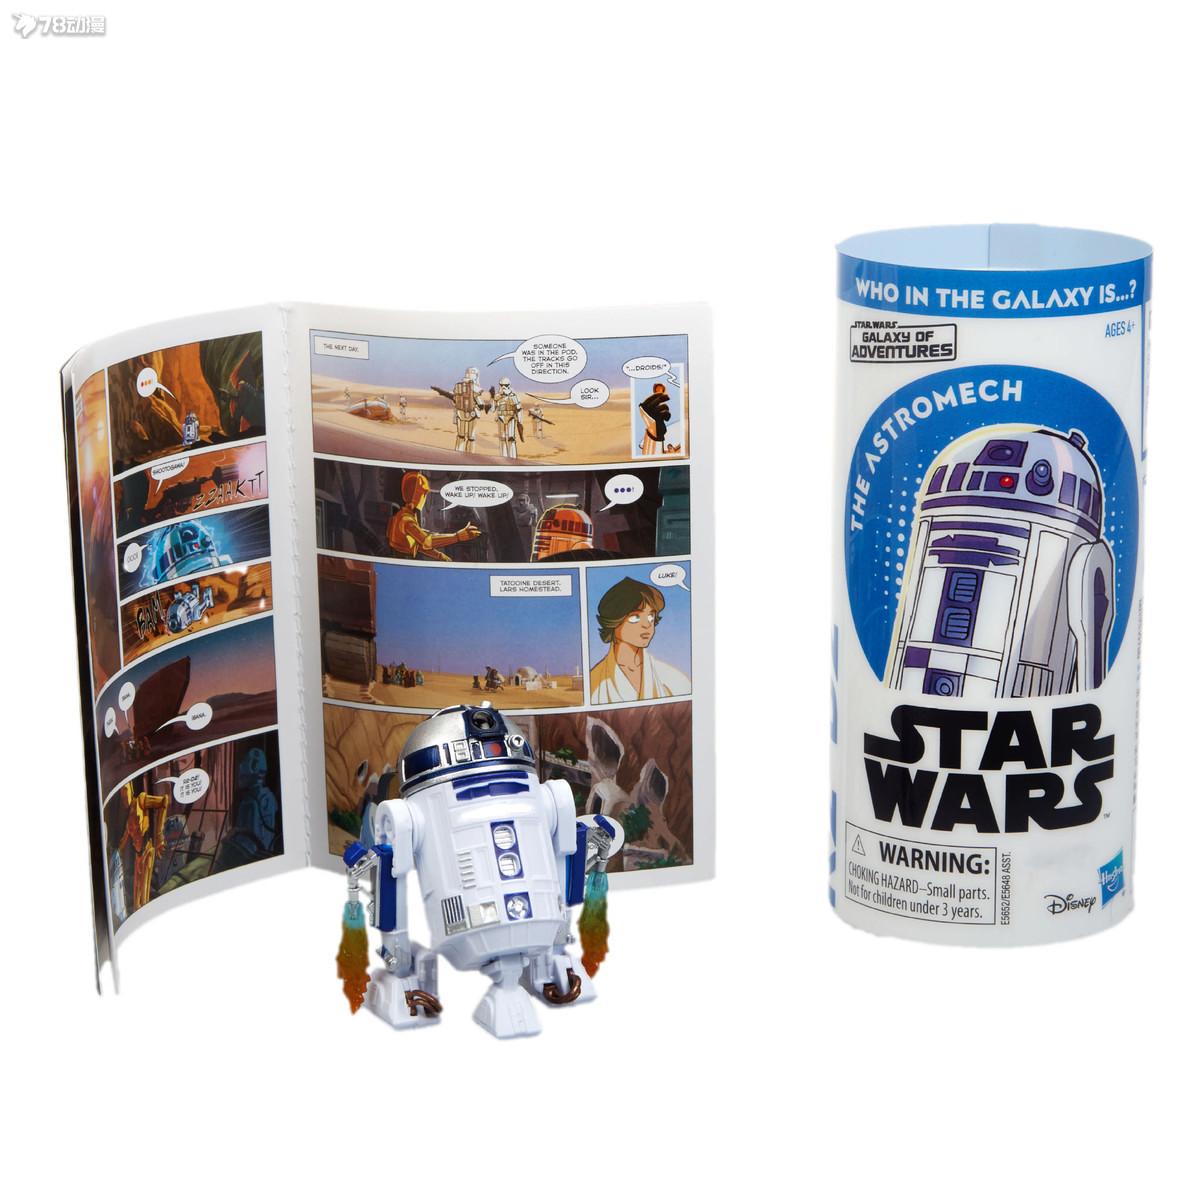 Star-Wars-Galaxy-Adventures-012.jpg